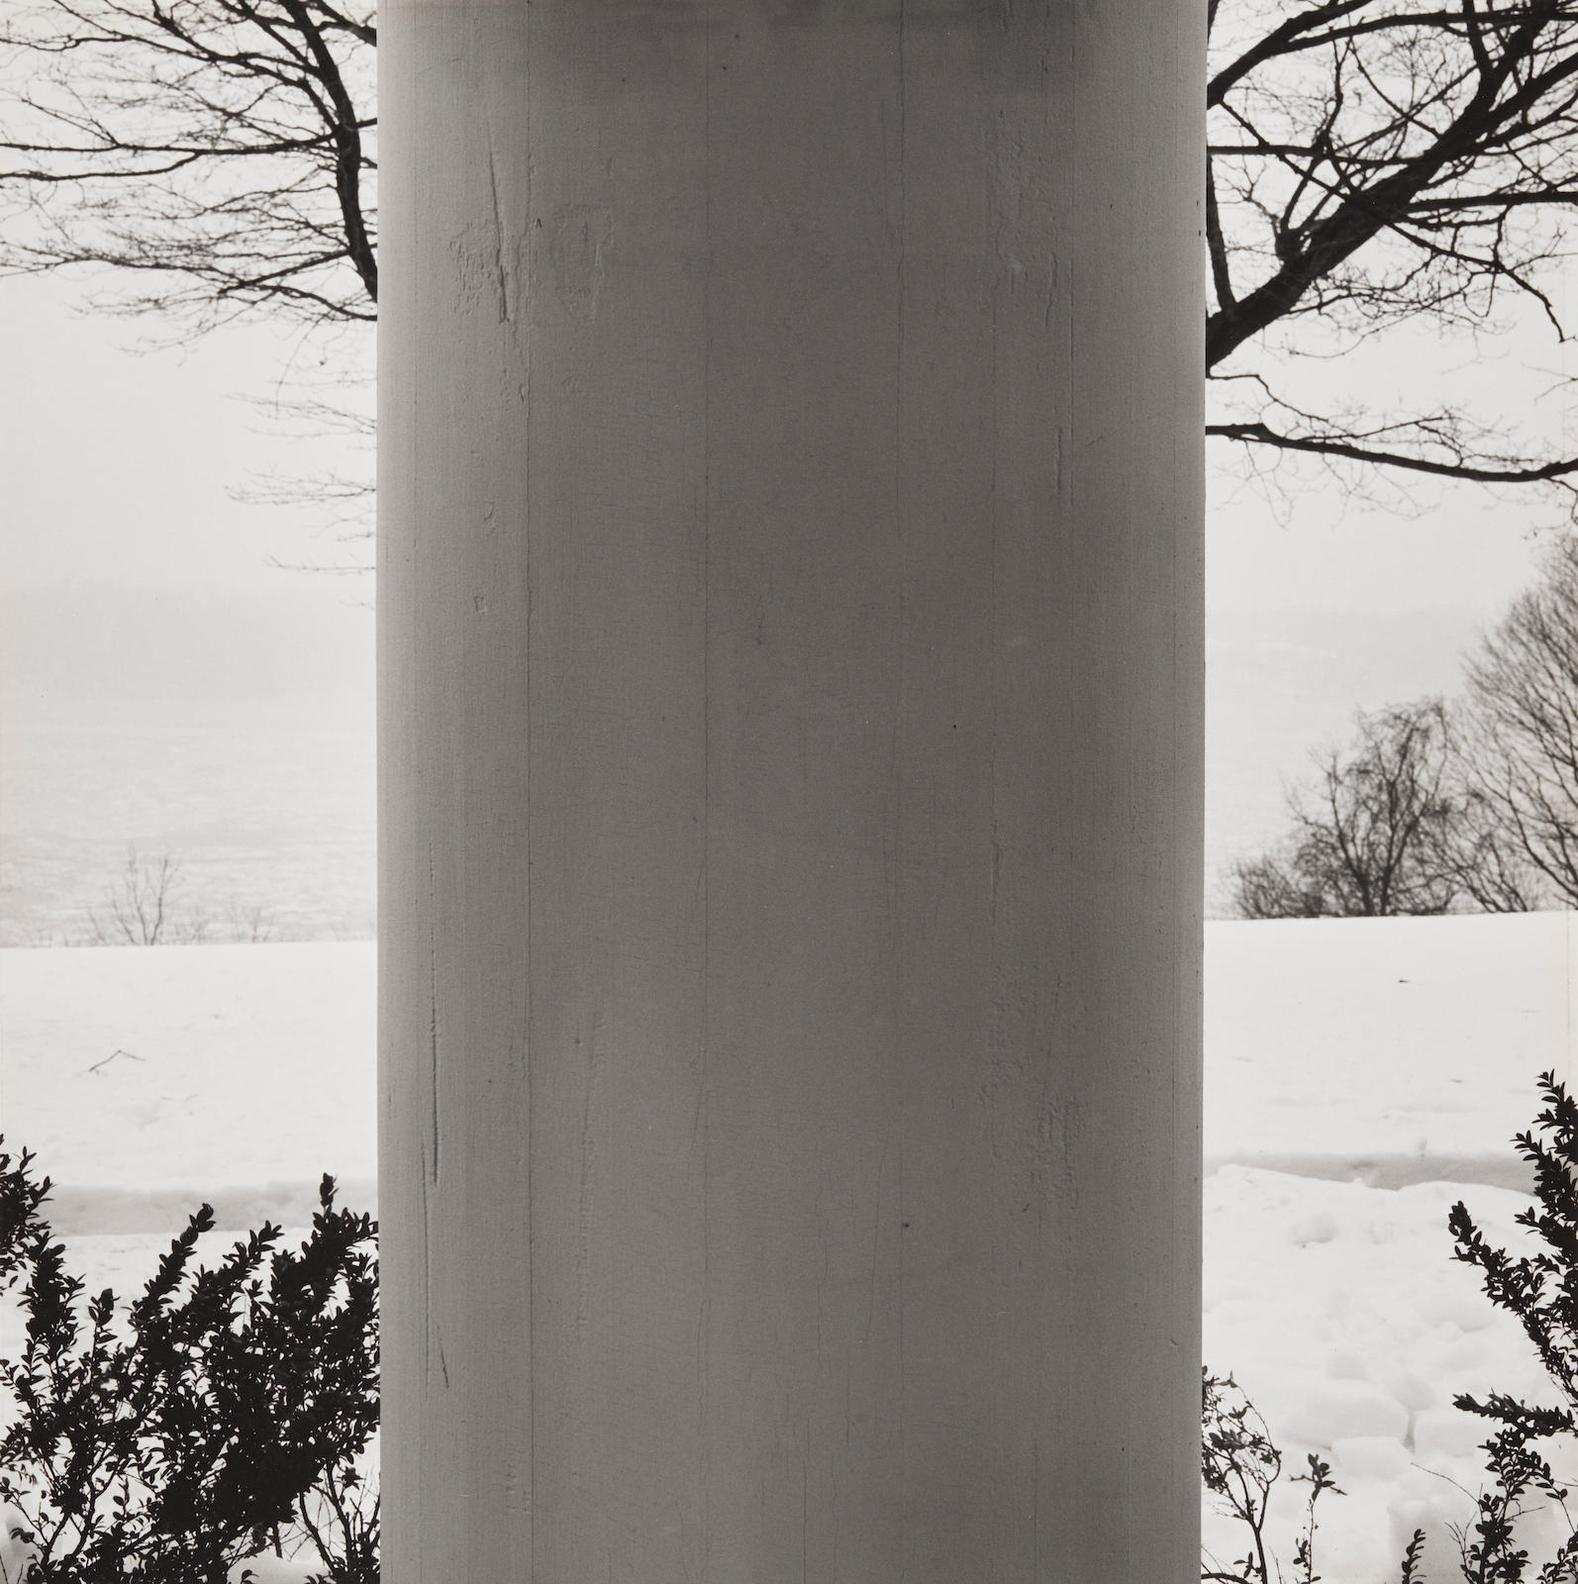 Robert Mapplethorpe-Winter Landscape (Pillar And Tree)-1979